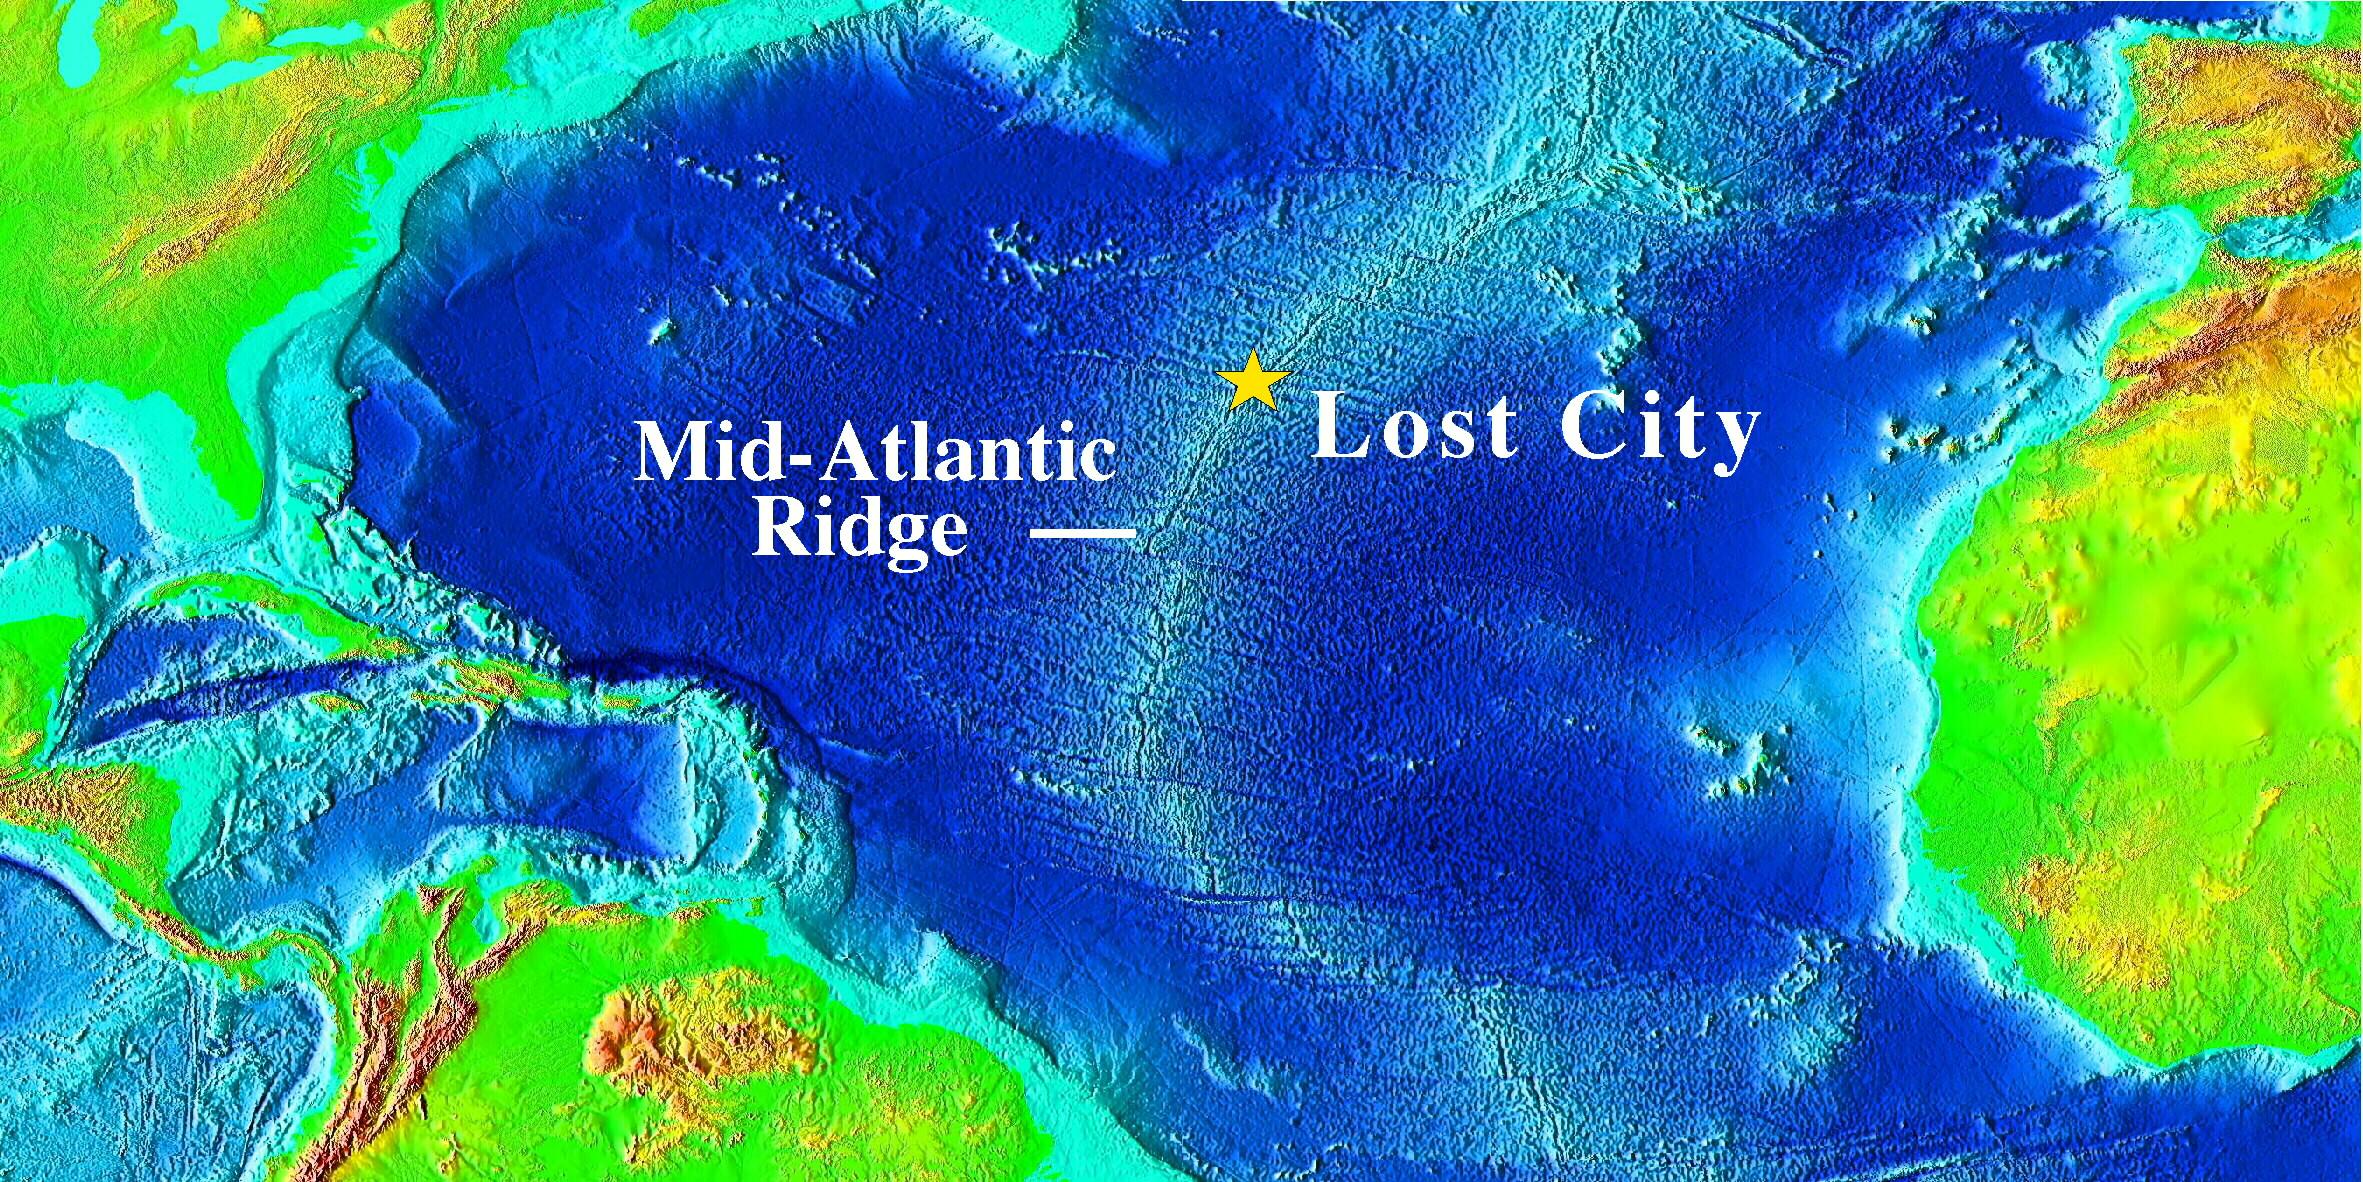 lost city ridge